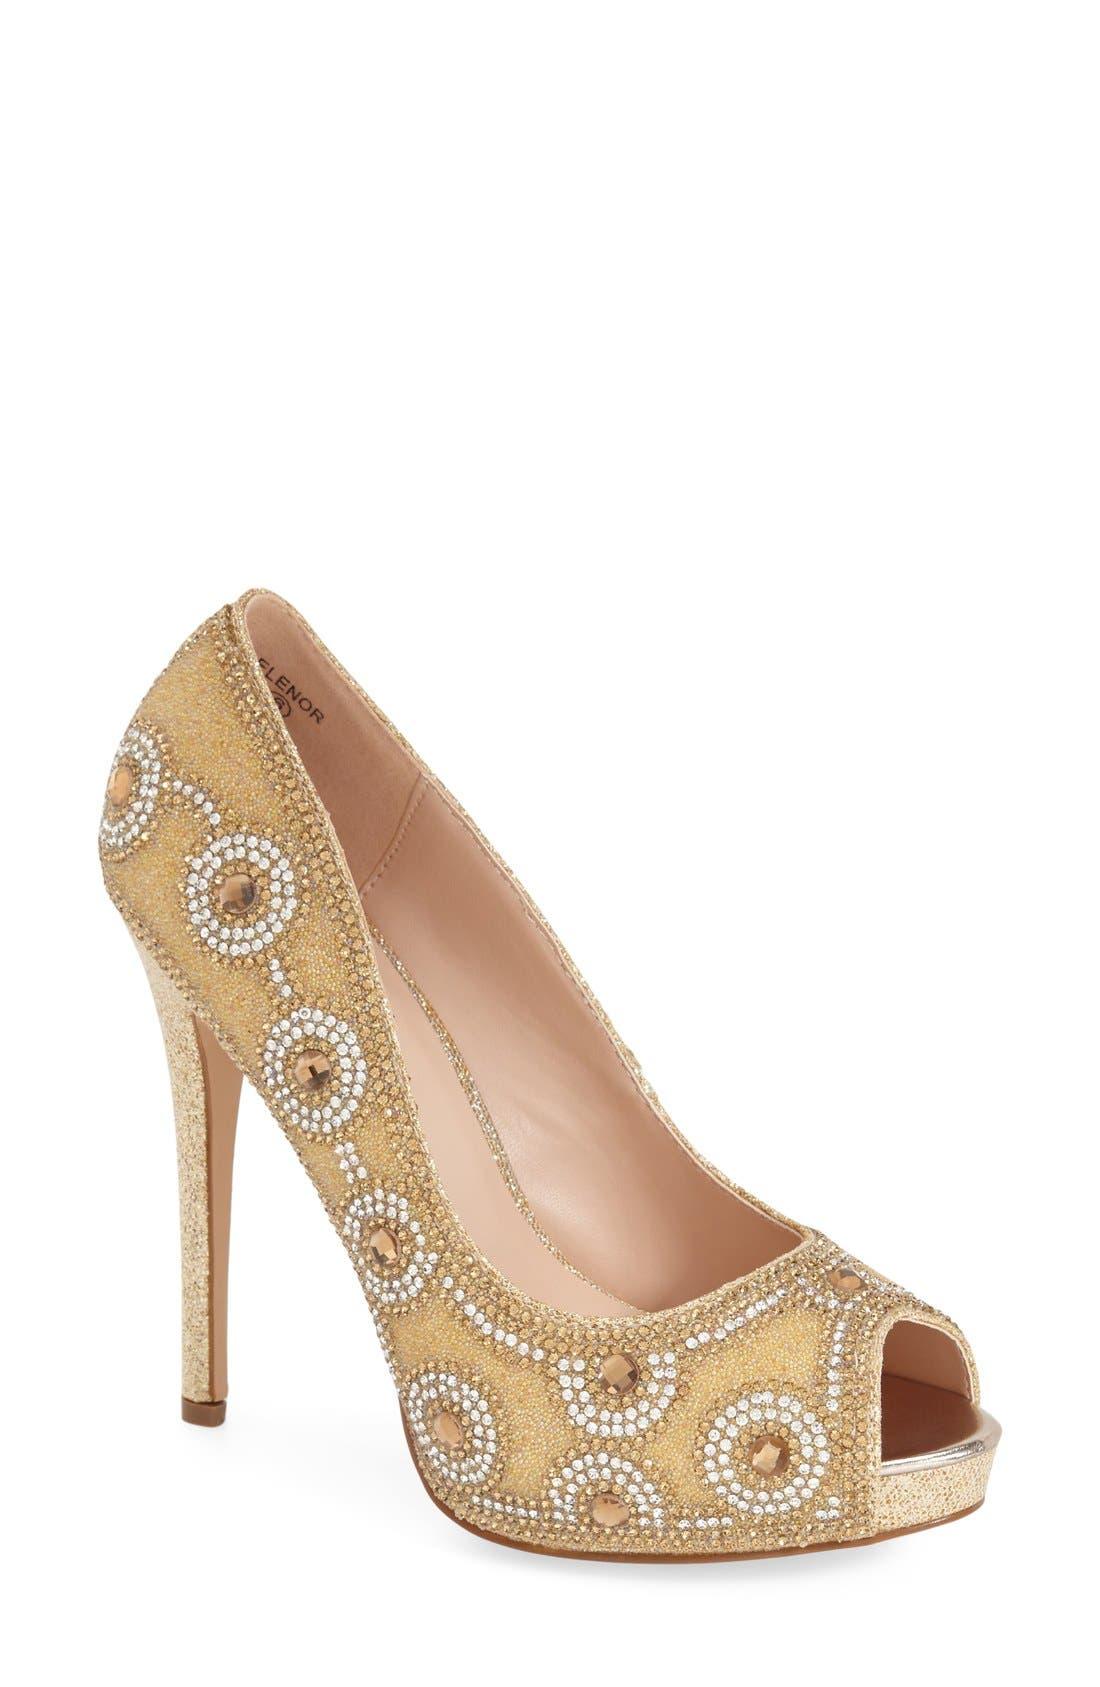 Main Image - Lauren Lorraine 'Elenor' Crystal Embellished Peep Toe Pump (Women)